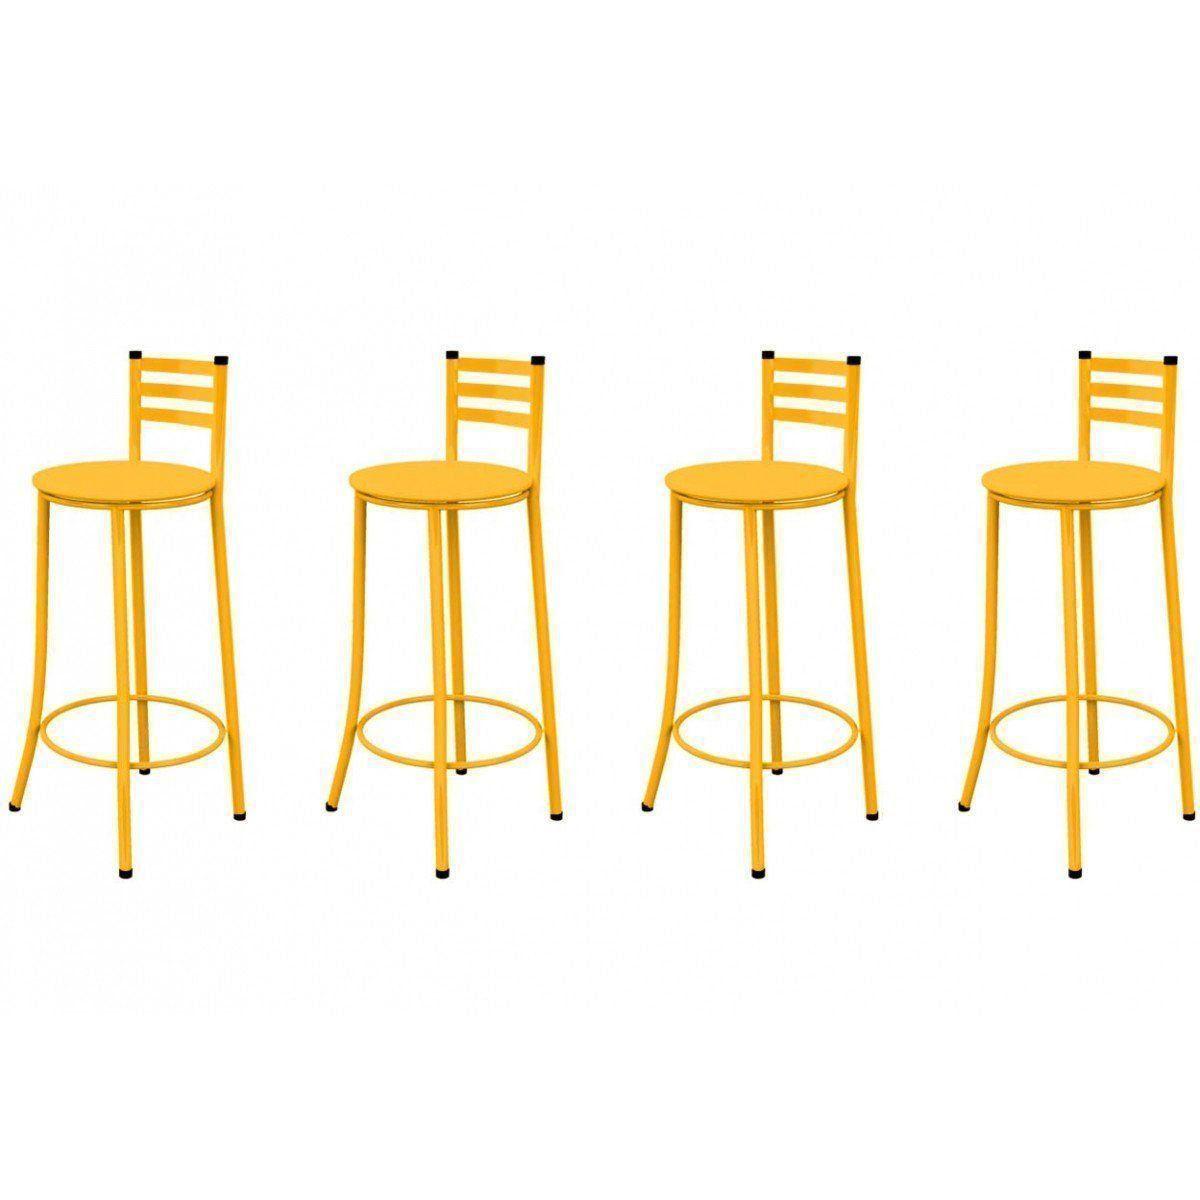 Kit 04 Banquetas Altas com Encosto 86 cm Amarelo - Marcheli